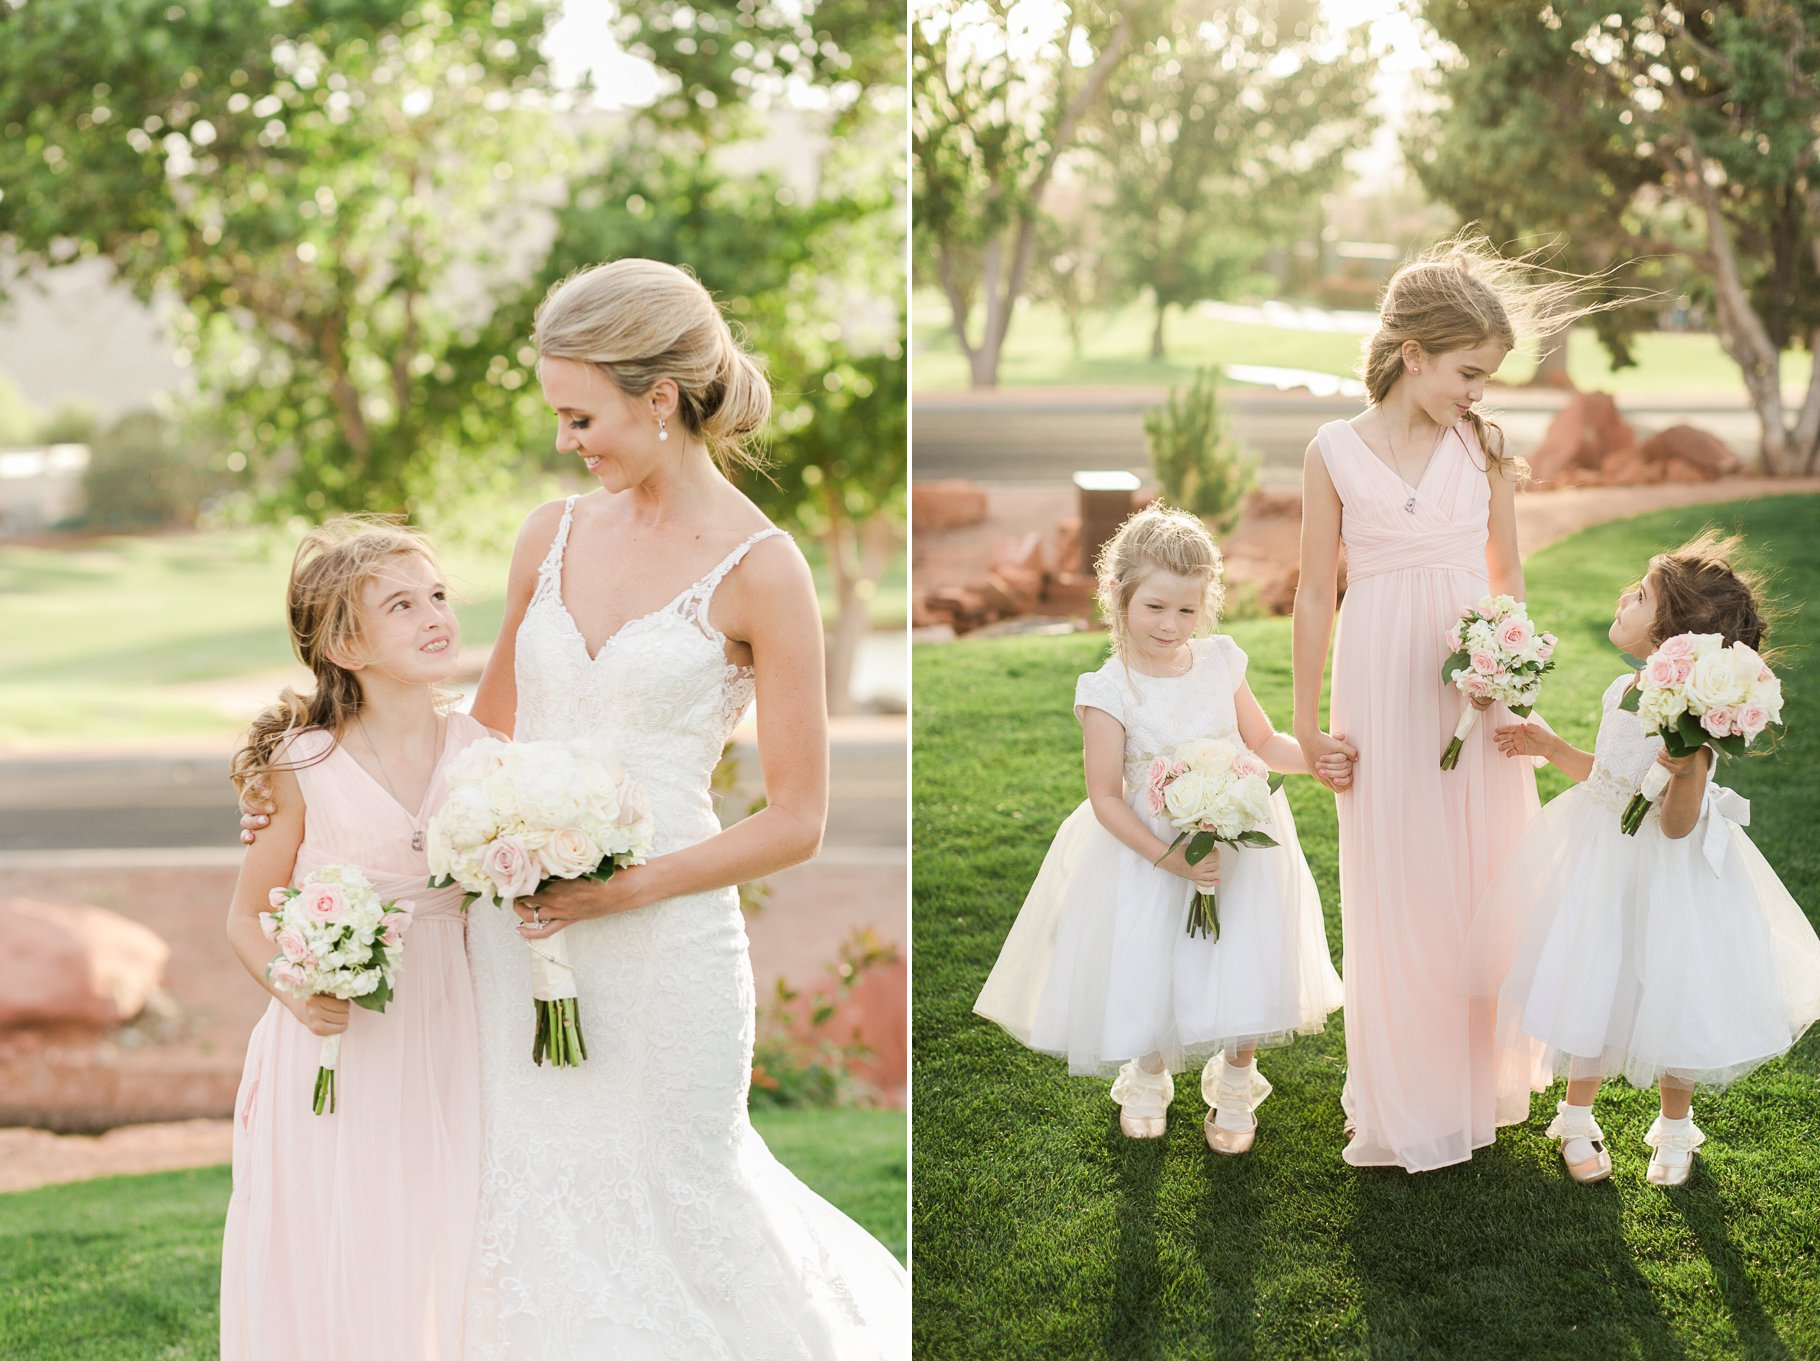 sedona wedding-97_GRETCHEN WAKEMAN PHOTOGRAPHY.jpg